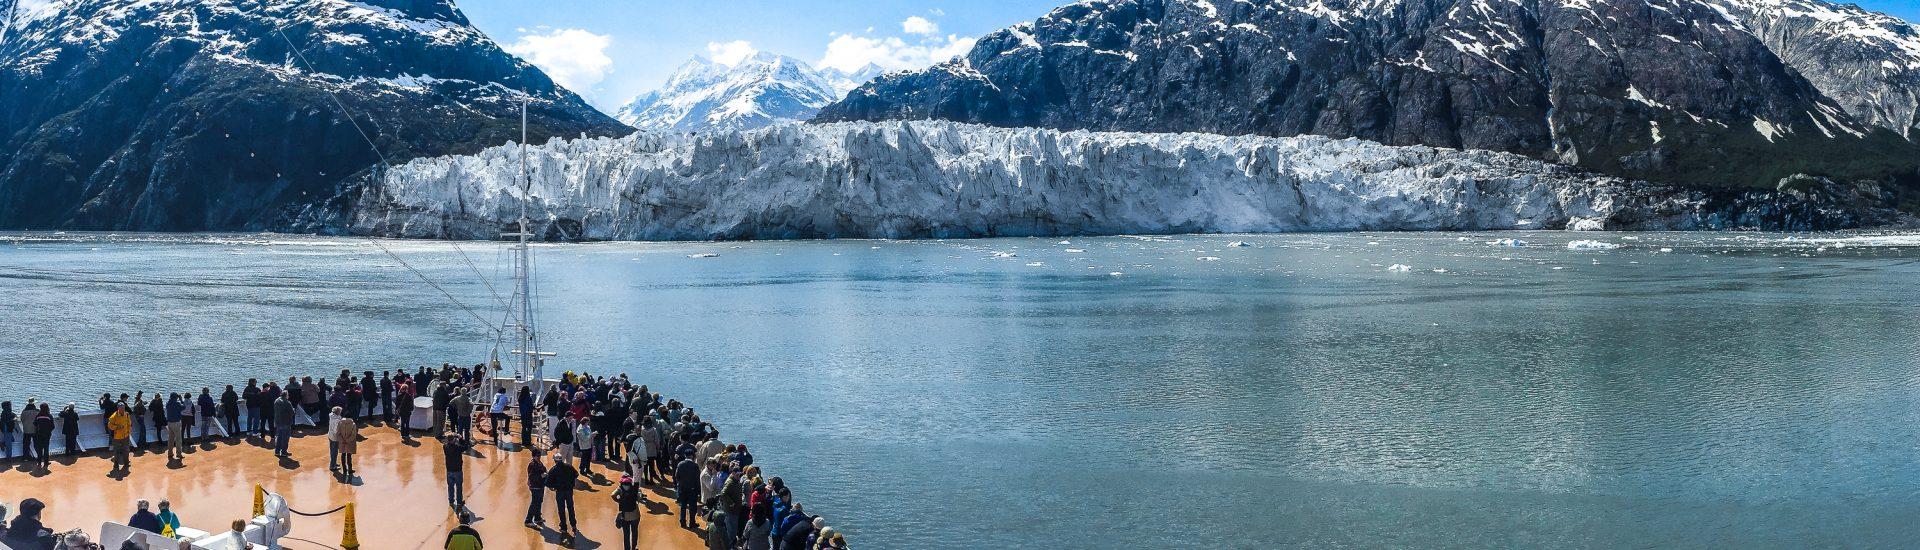 Alaska Cruise Inside Passage Margerie Glacier